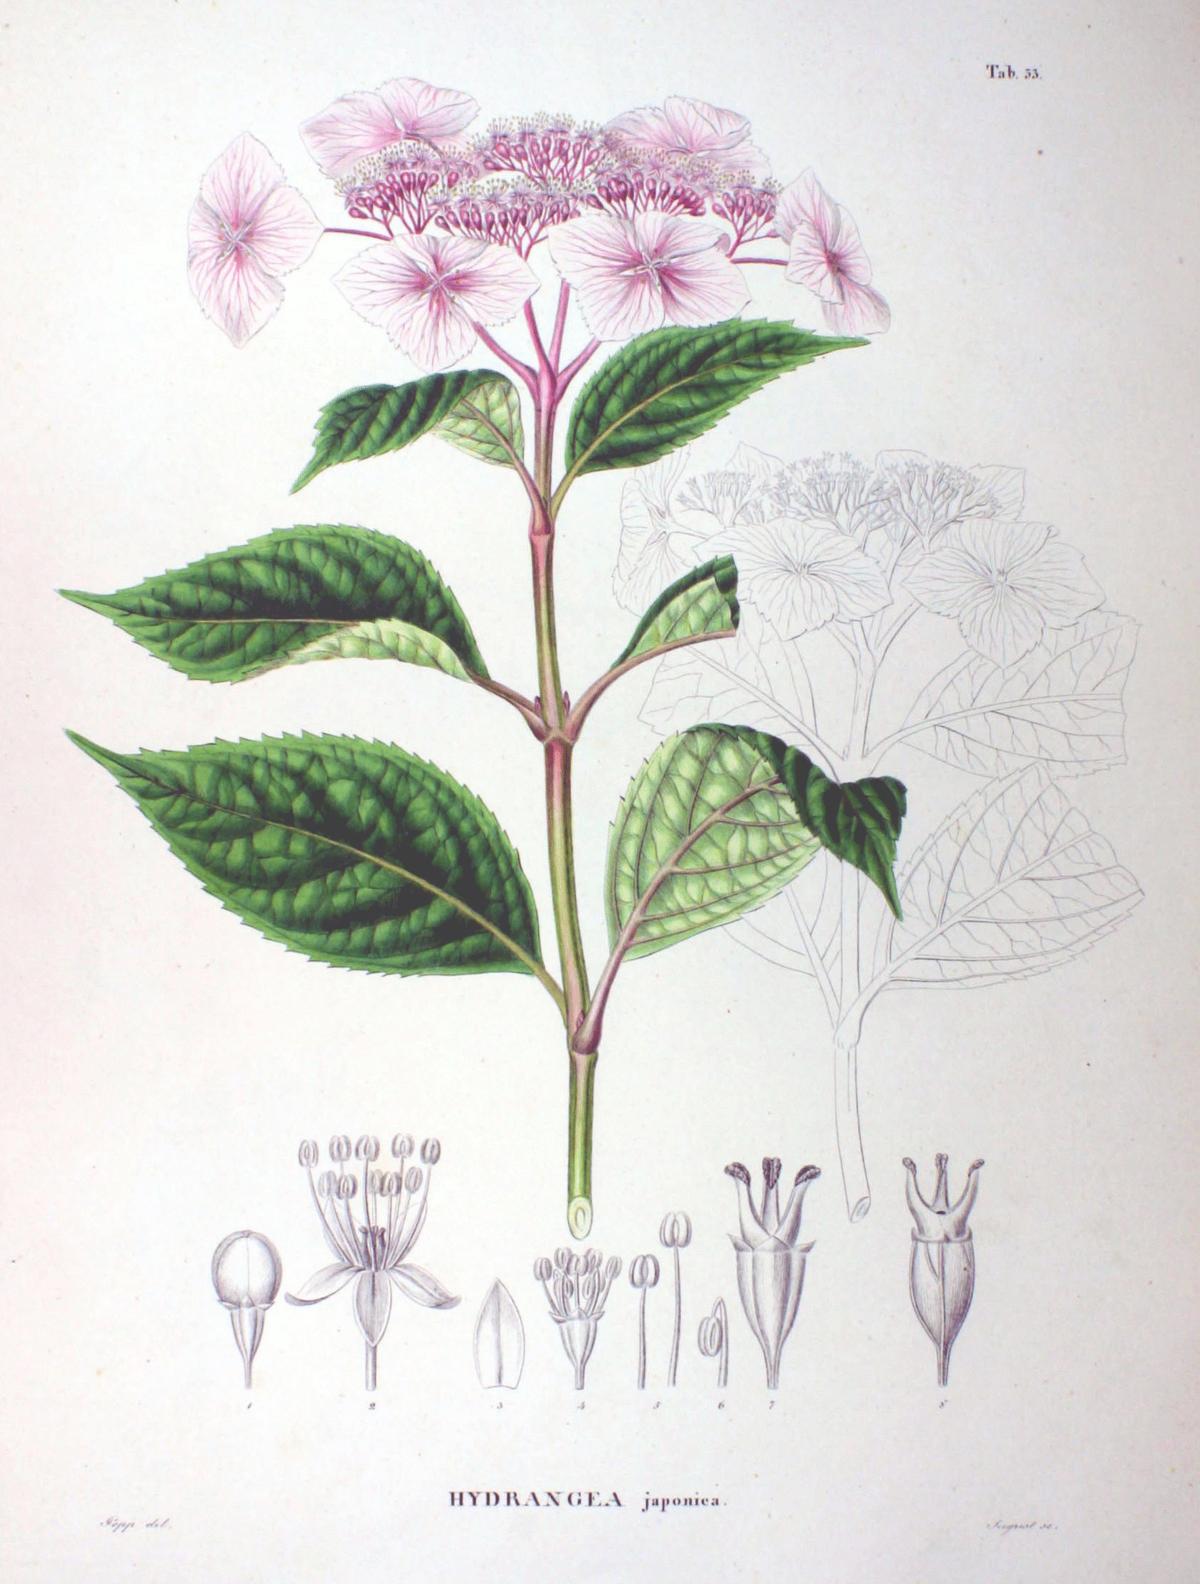 Hydrangea macrophylla wikip dia - Maladie des hortensias photos ...